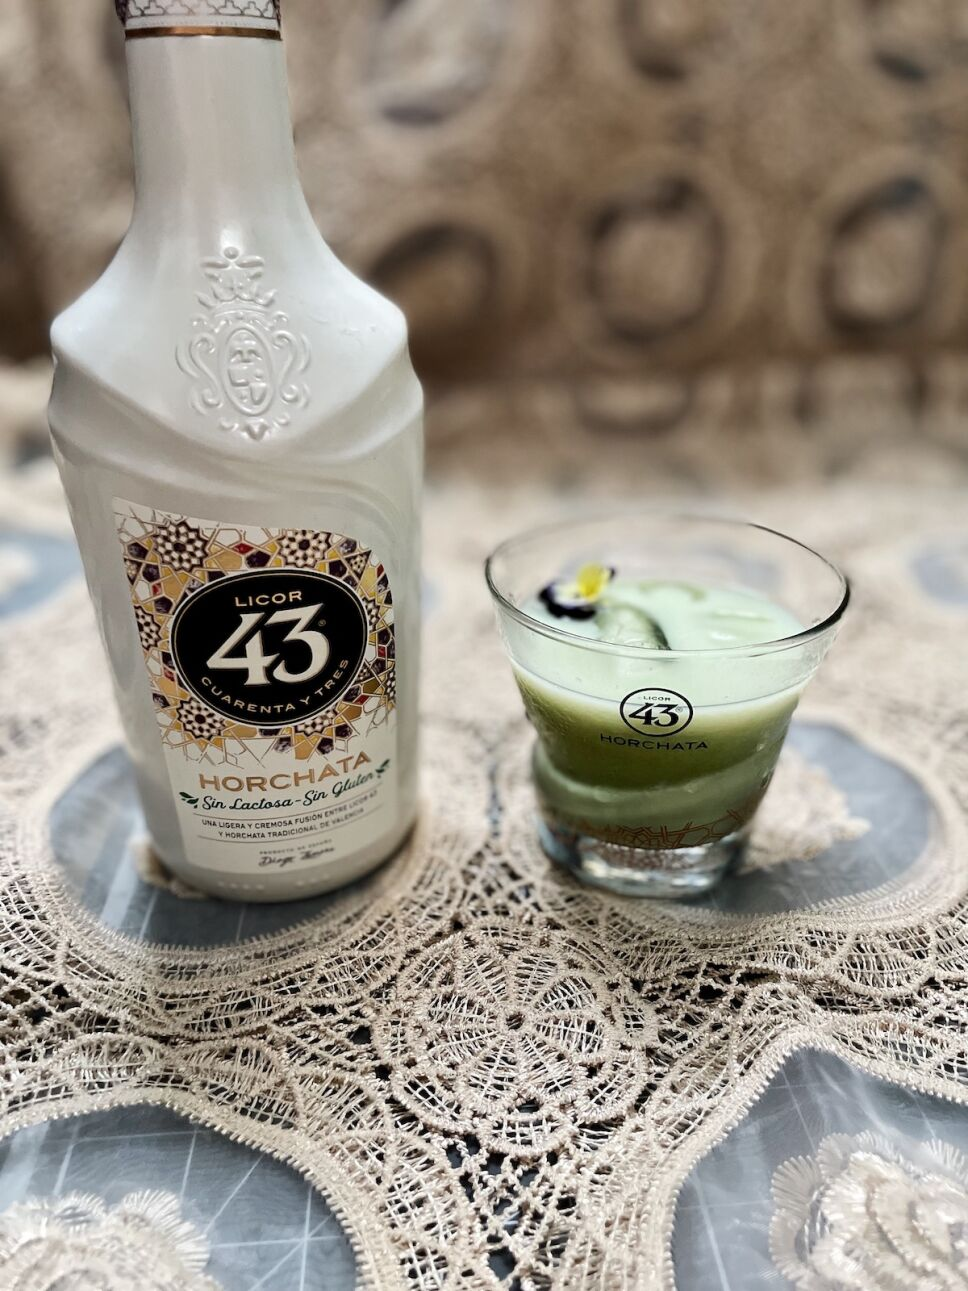 coctel con licor 43 horchata matcha